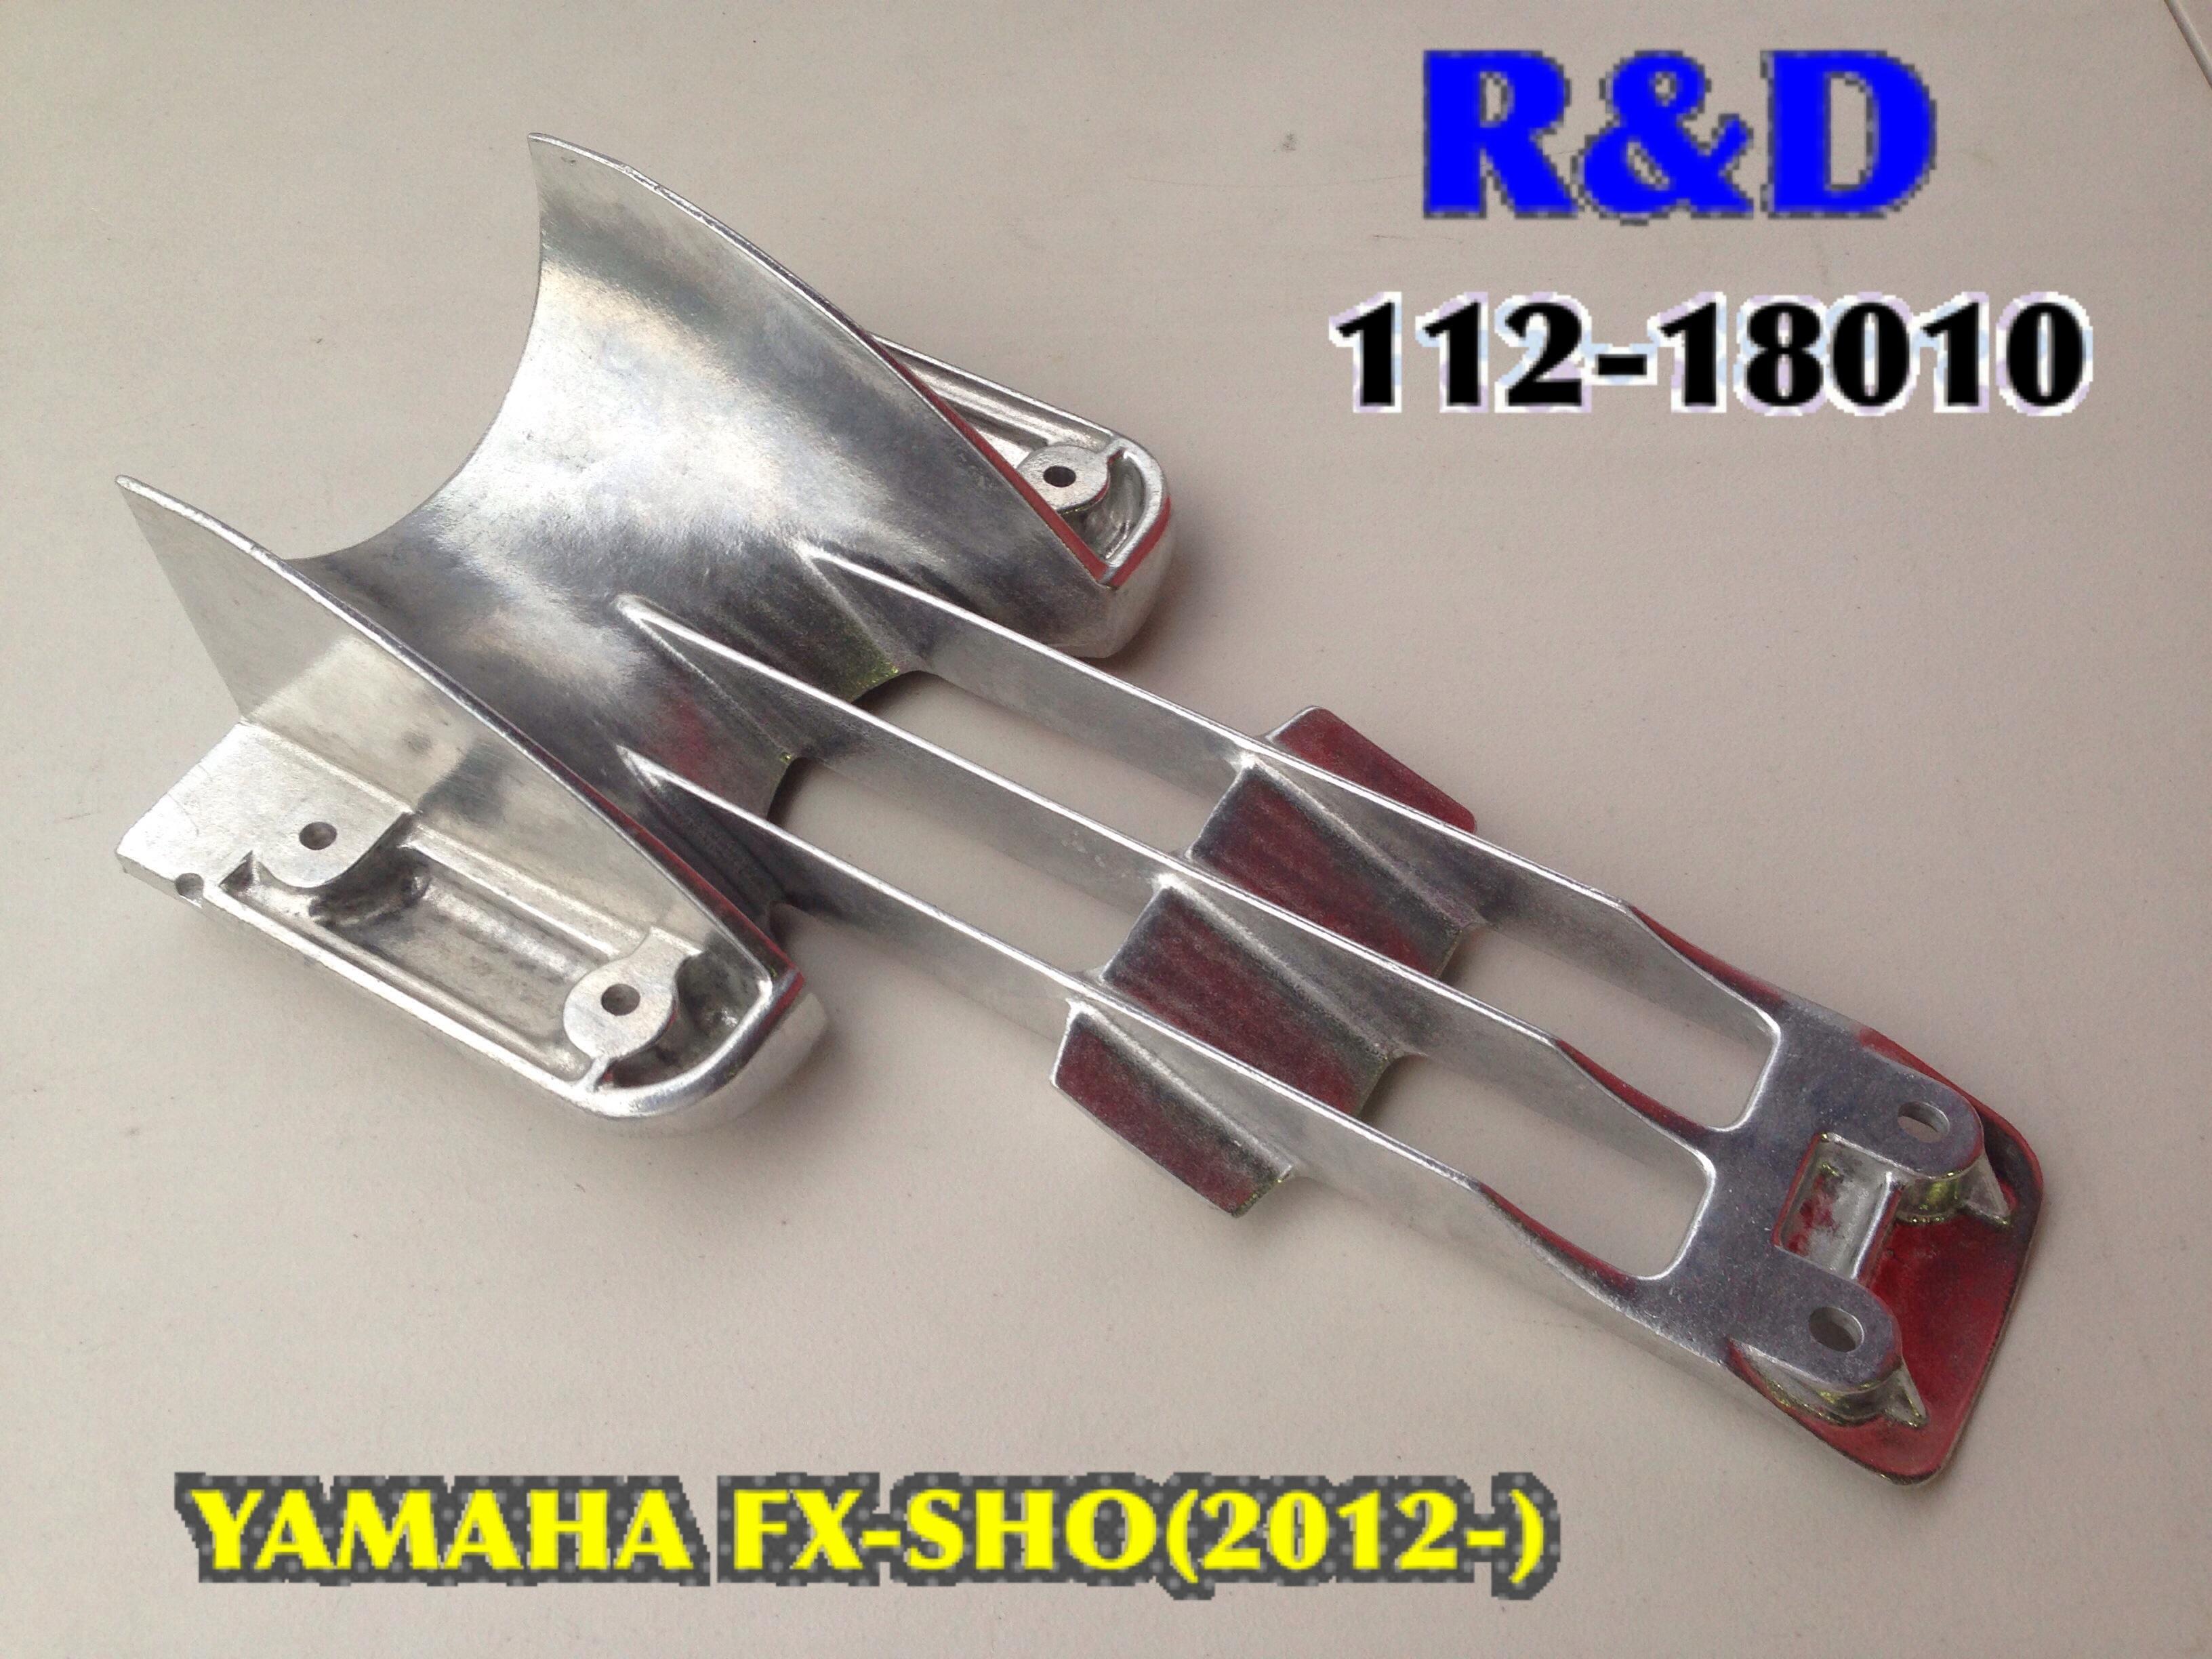 【112-18010】R&D アクアベインゲート YAMAHA FX-SVHO(2012-)